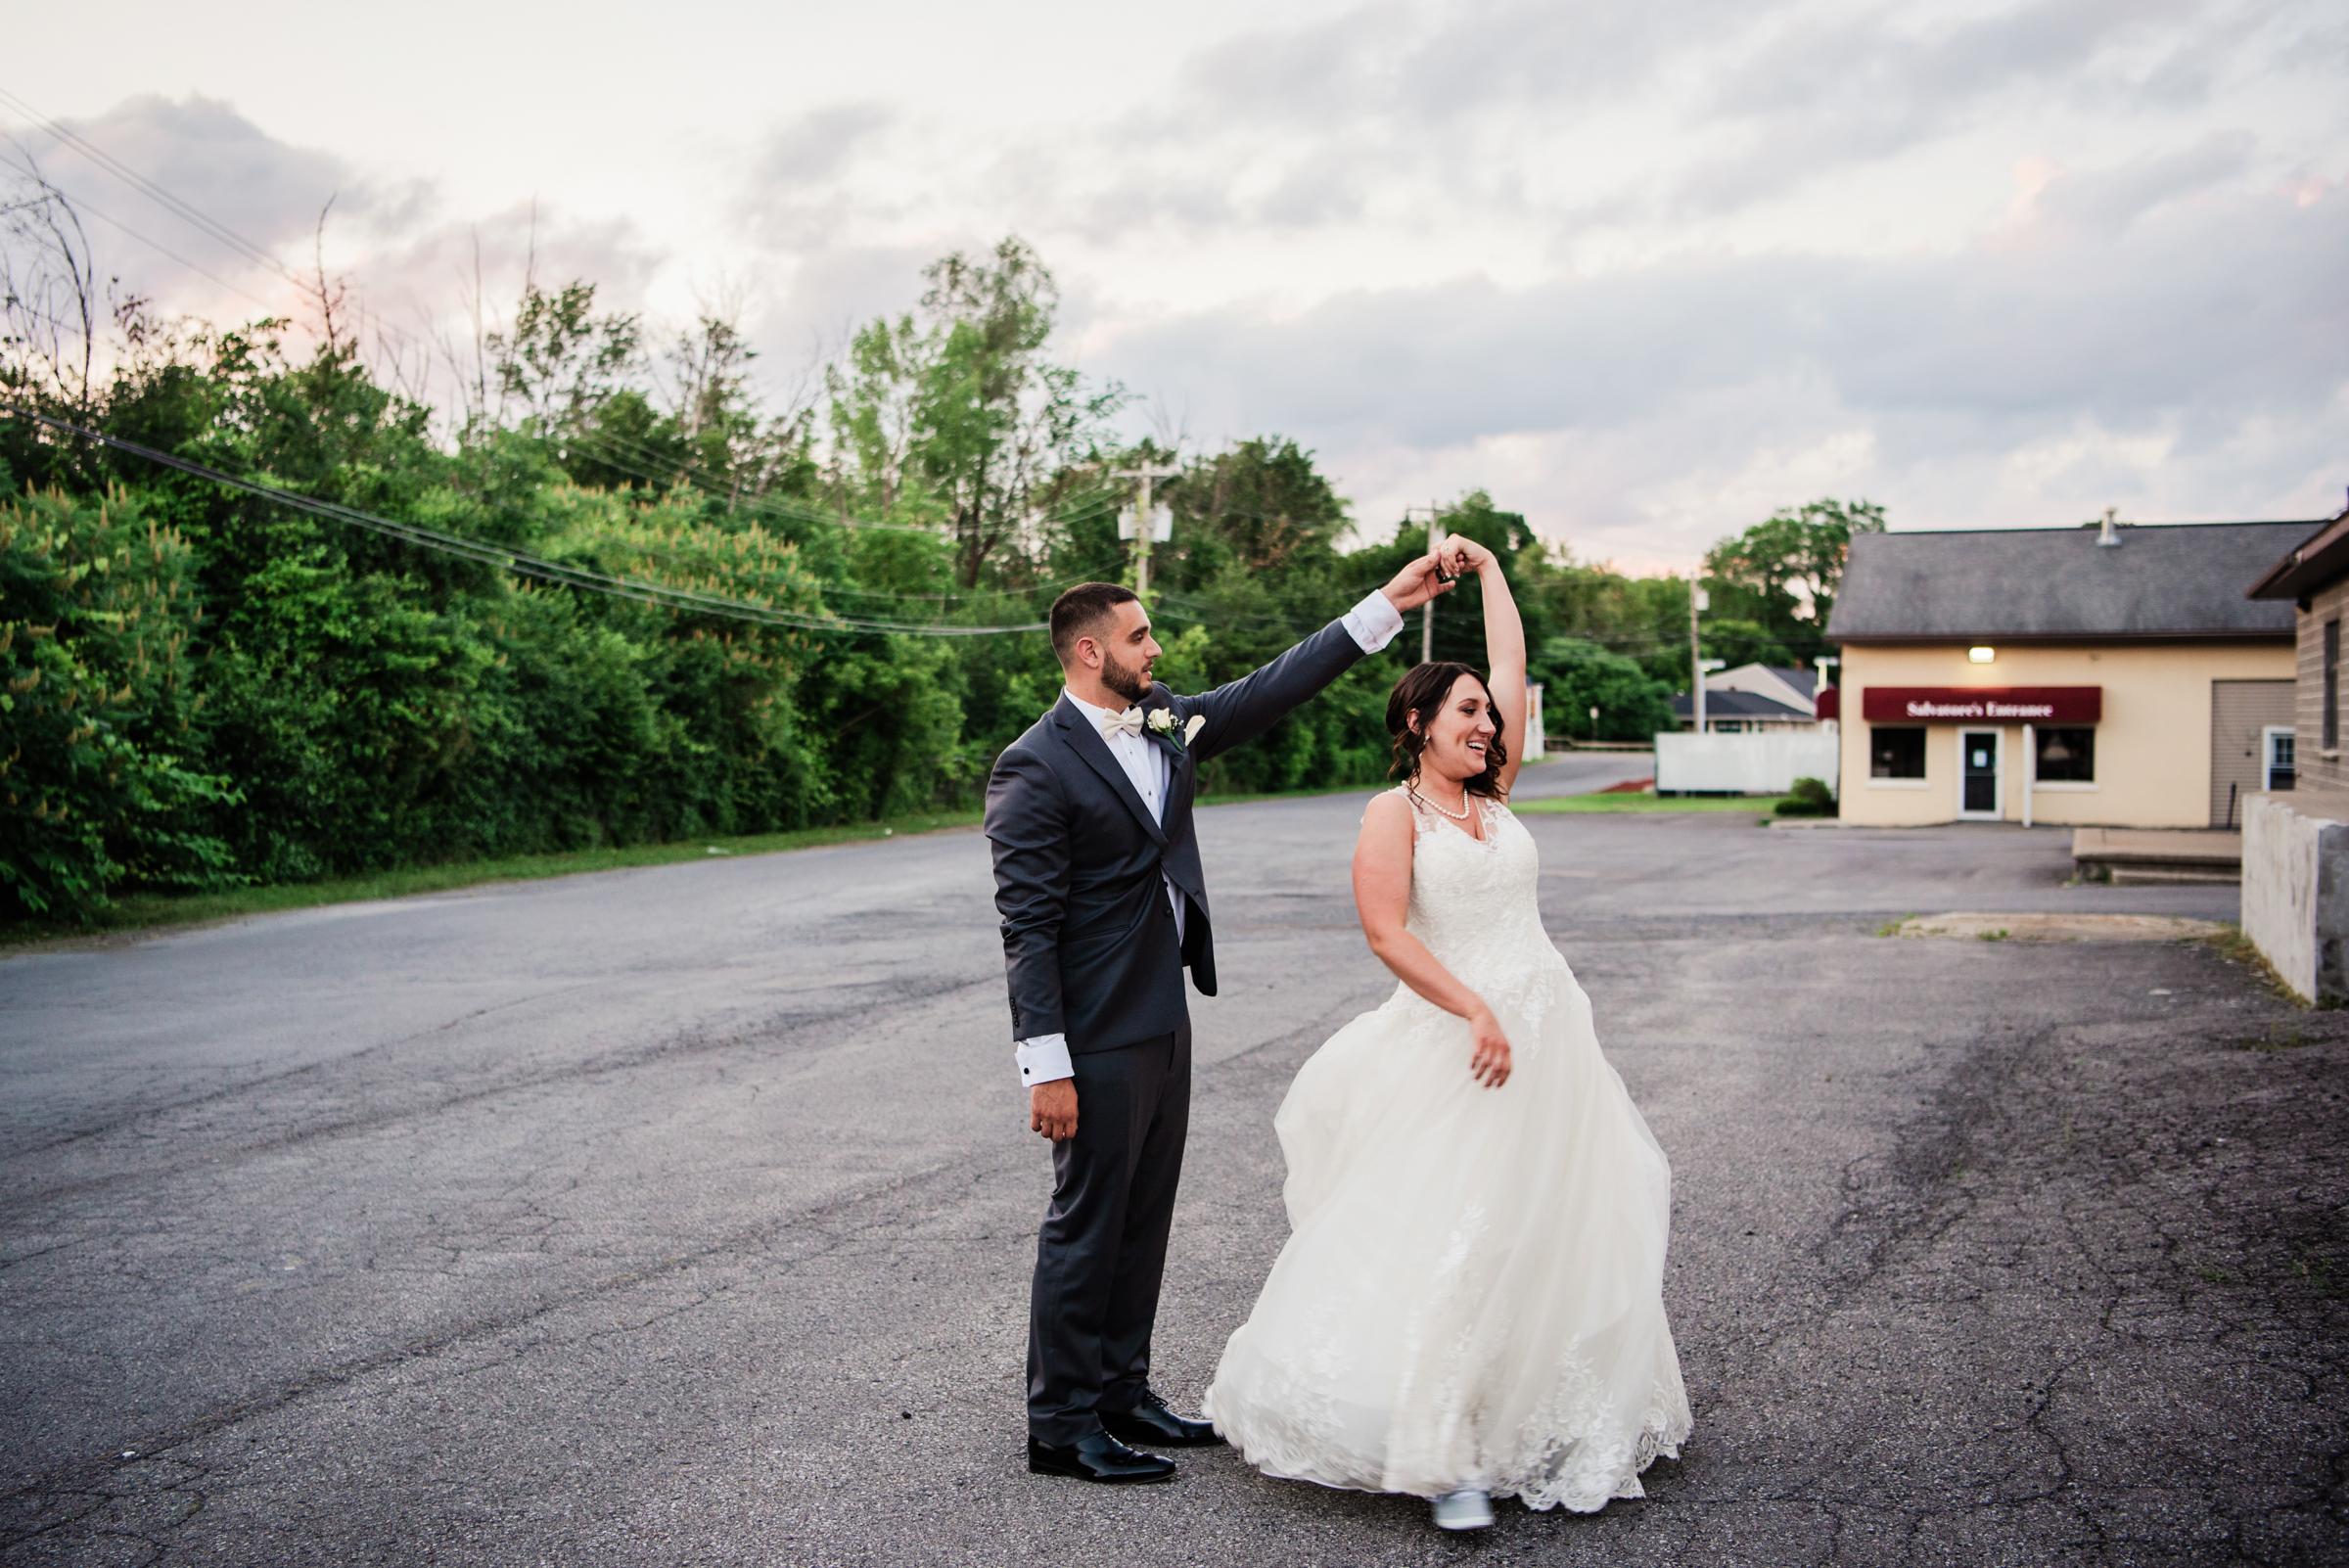 Historic_Old_St_Johns_Church_Valentinos_Banquet_Hall_Central_NY_Wedding_JILL_STUDIO_Rochester_NY_Photographer_DSC_6976.jpg